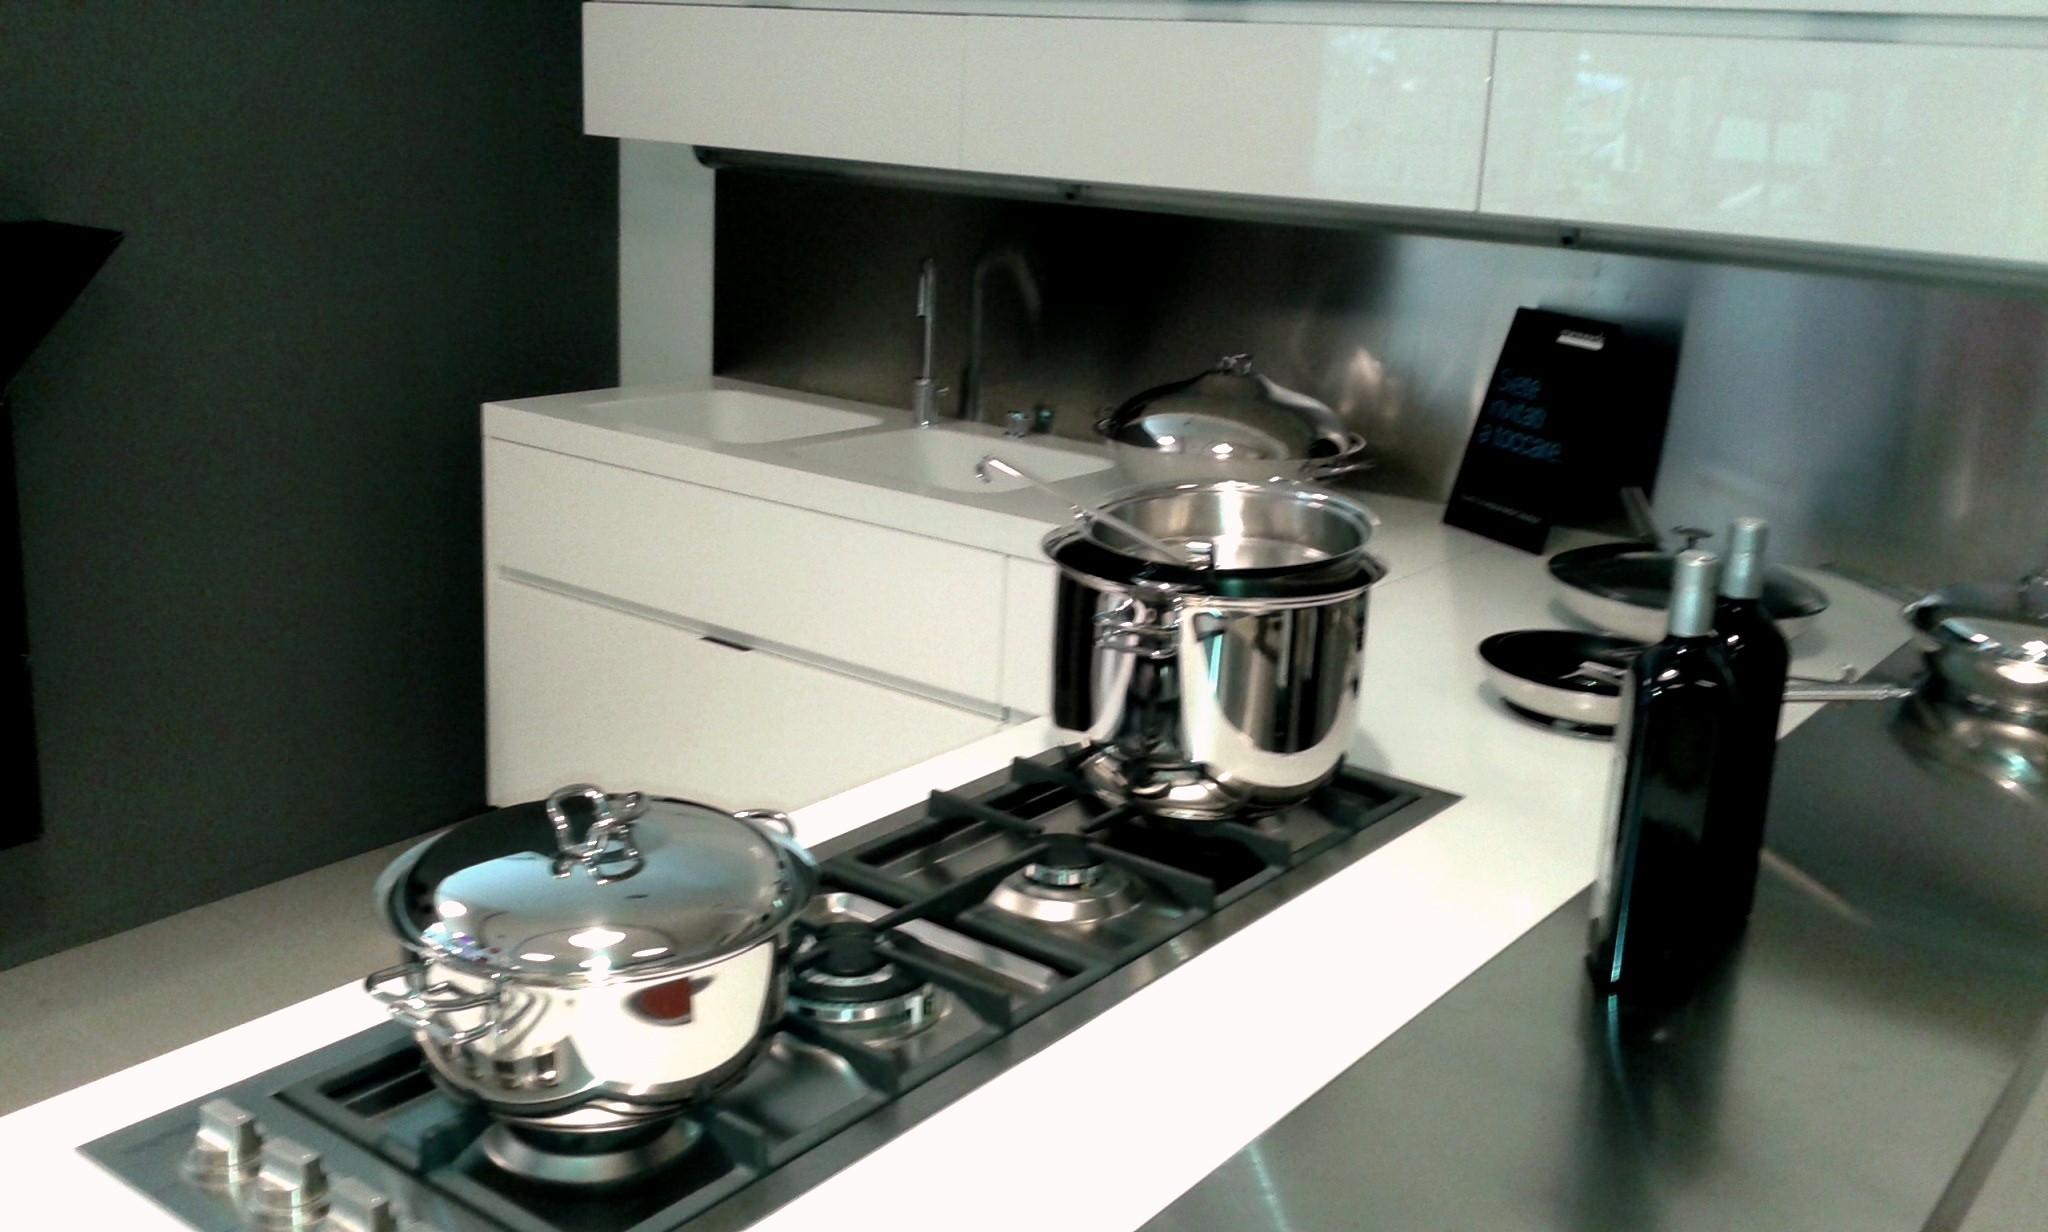 Cucina All Americana Moderna : Cucina all americana moderna ...